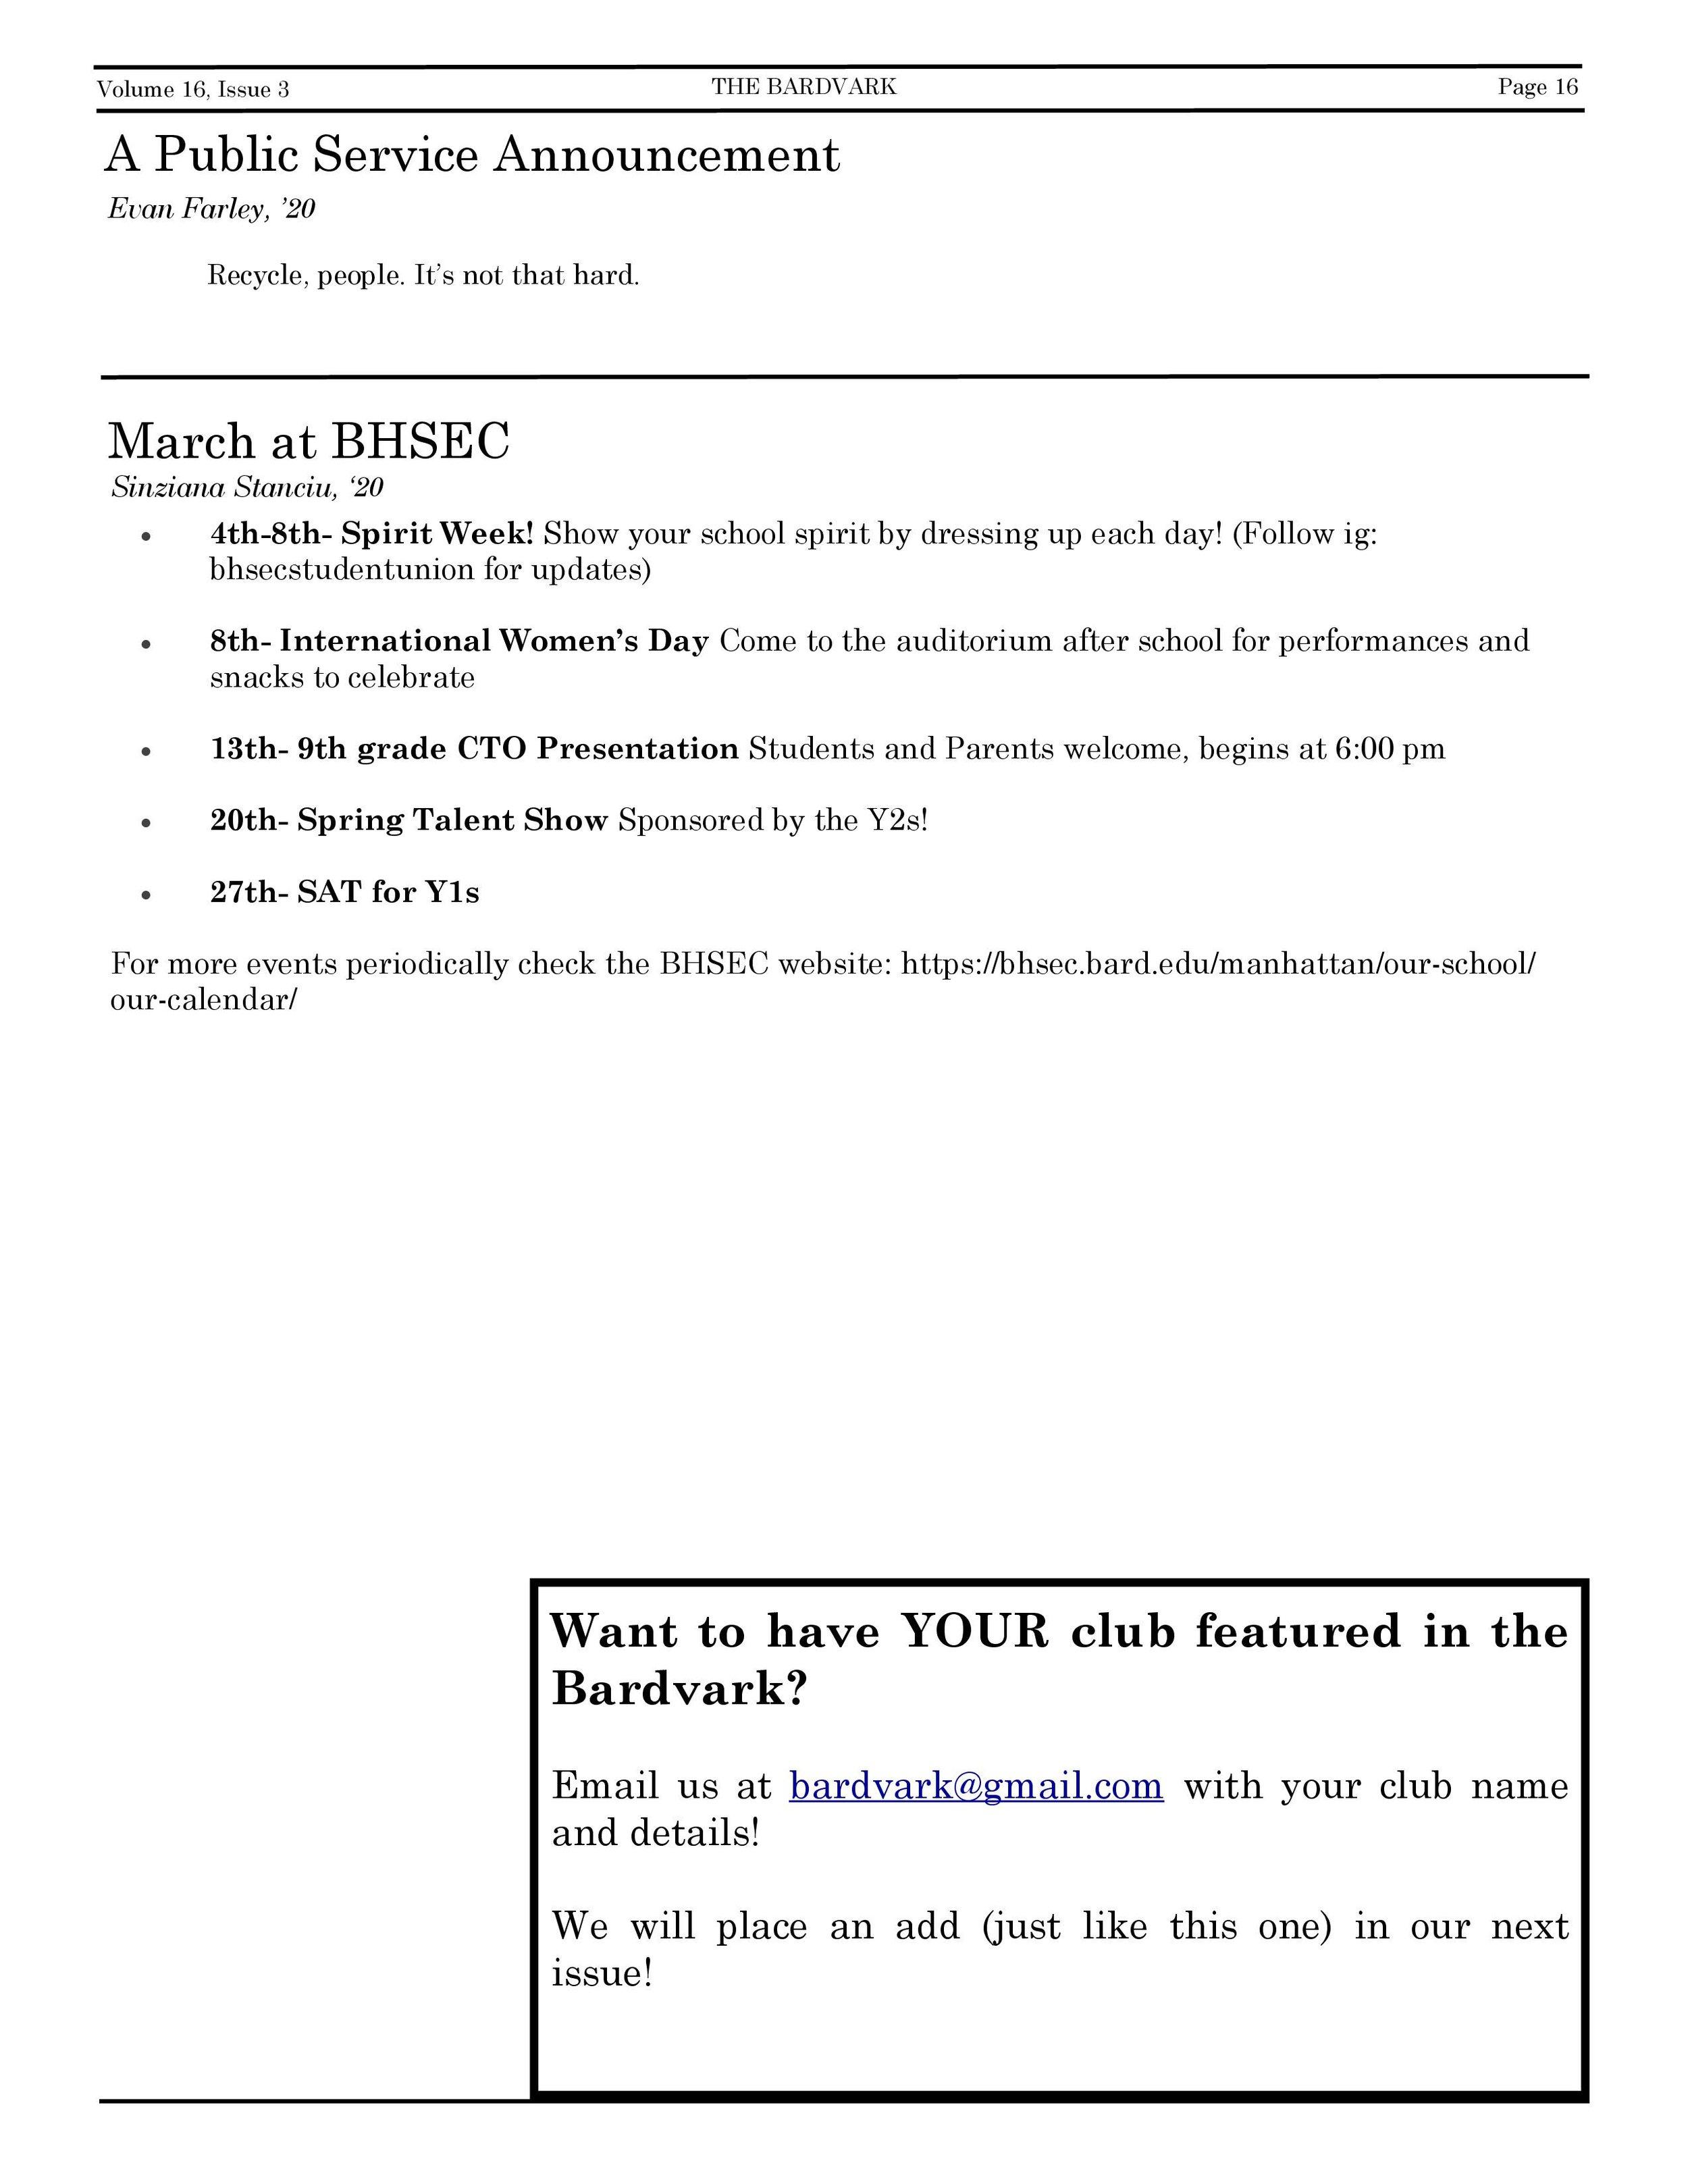 Issue 6 February 2019-16.jpg